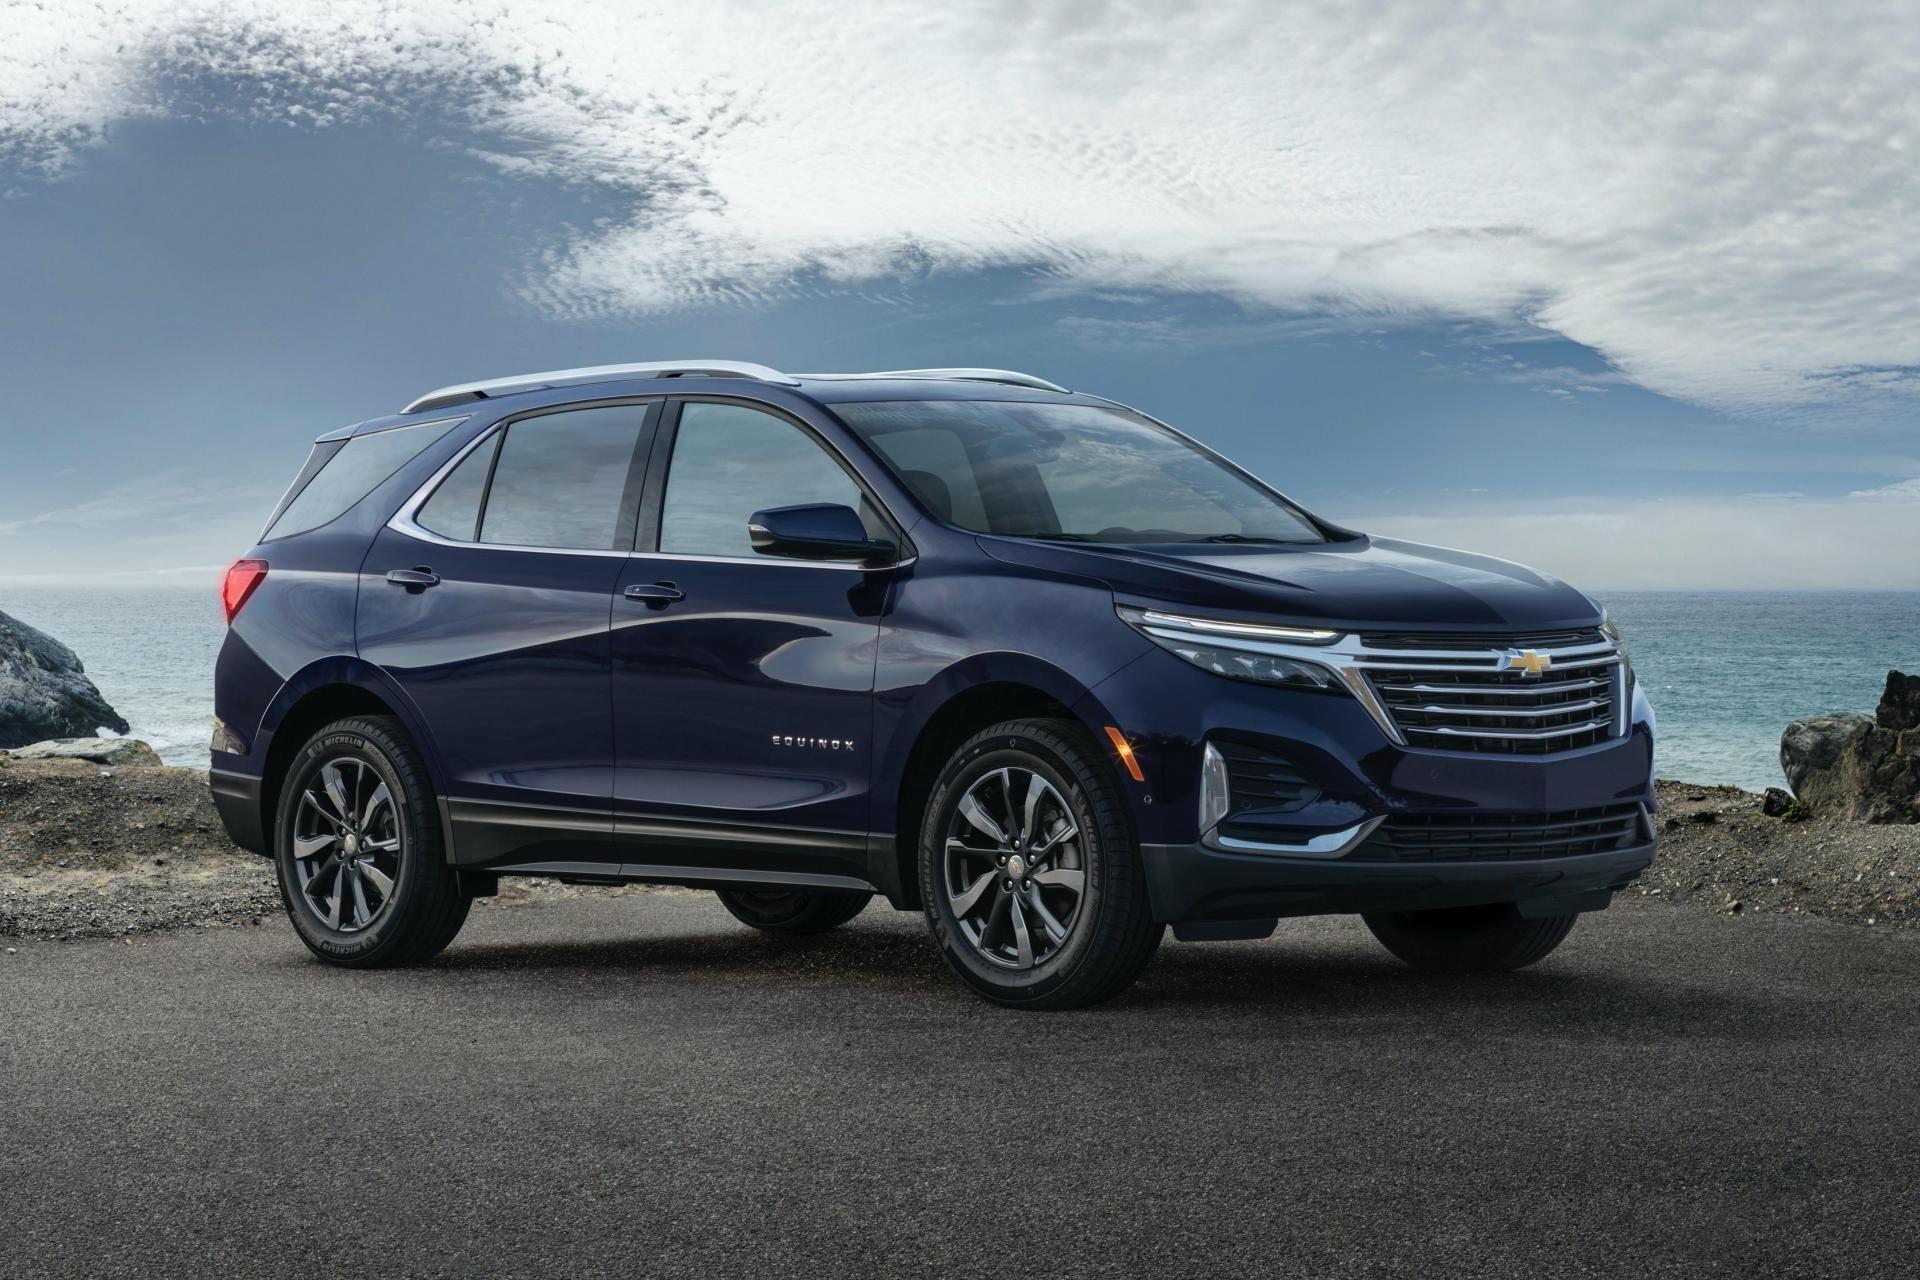 Chevrolet-Equinox-facelift-2020-11